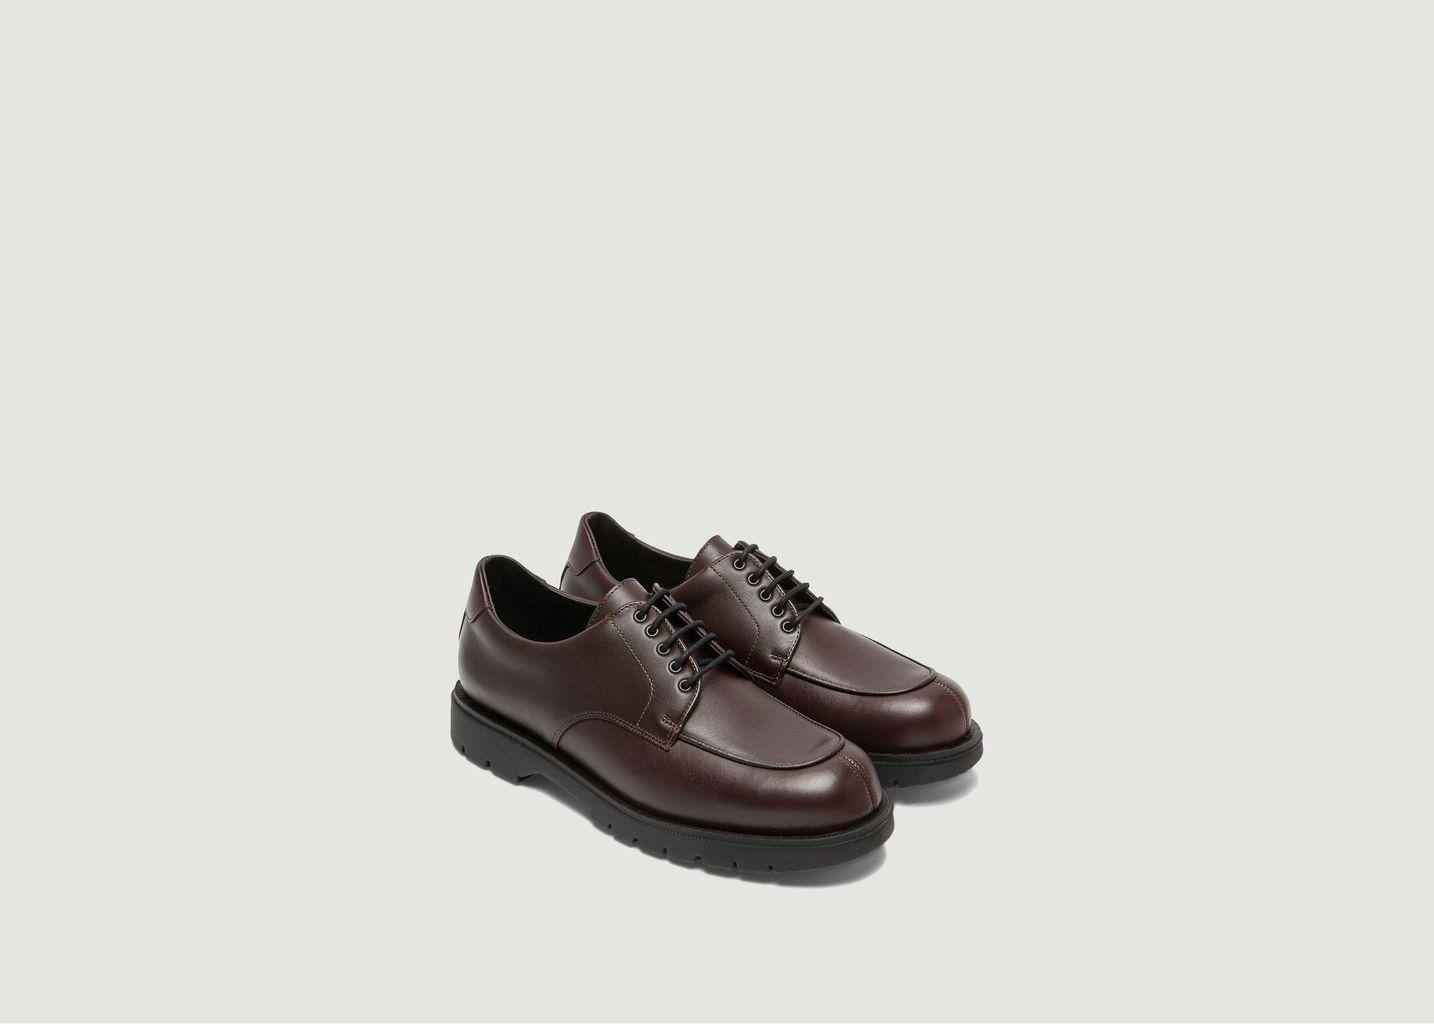 Chaussures Officier - Kleman